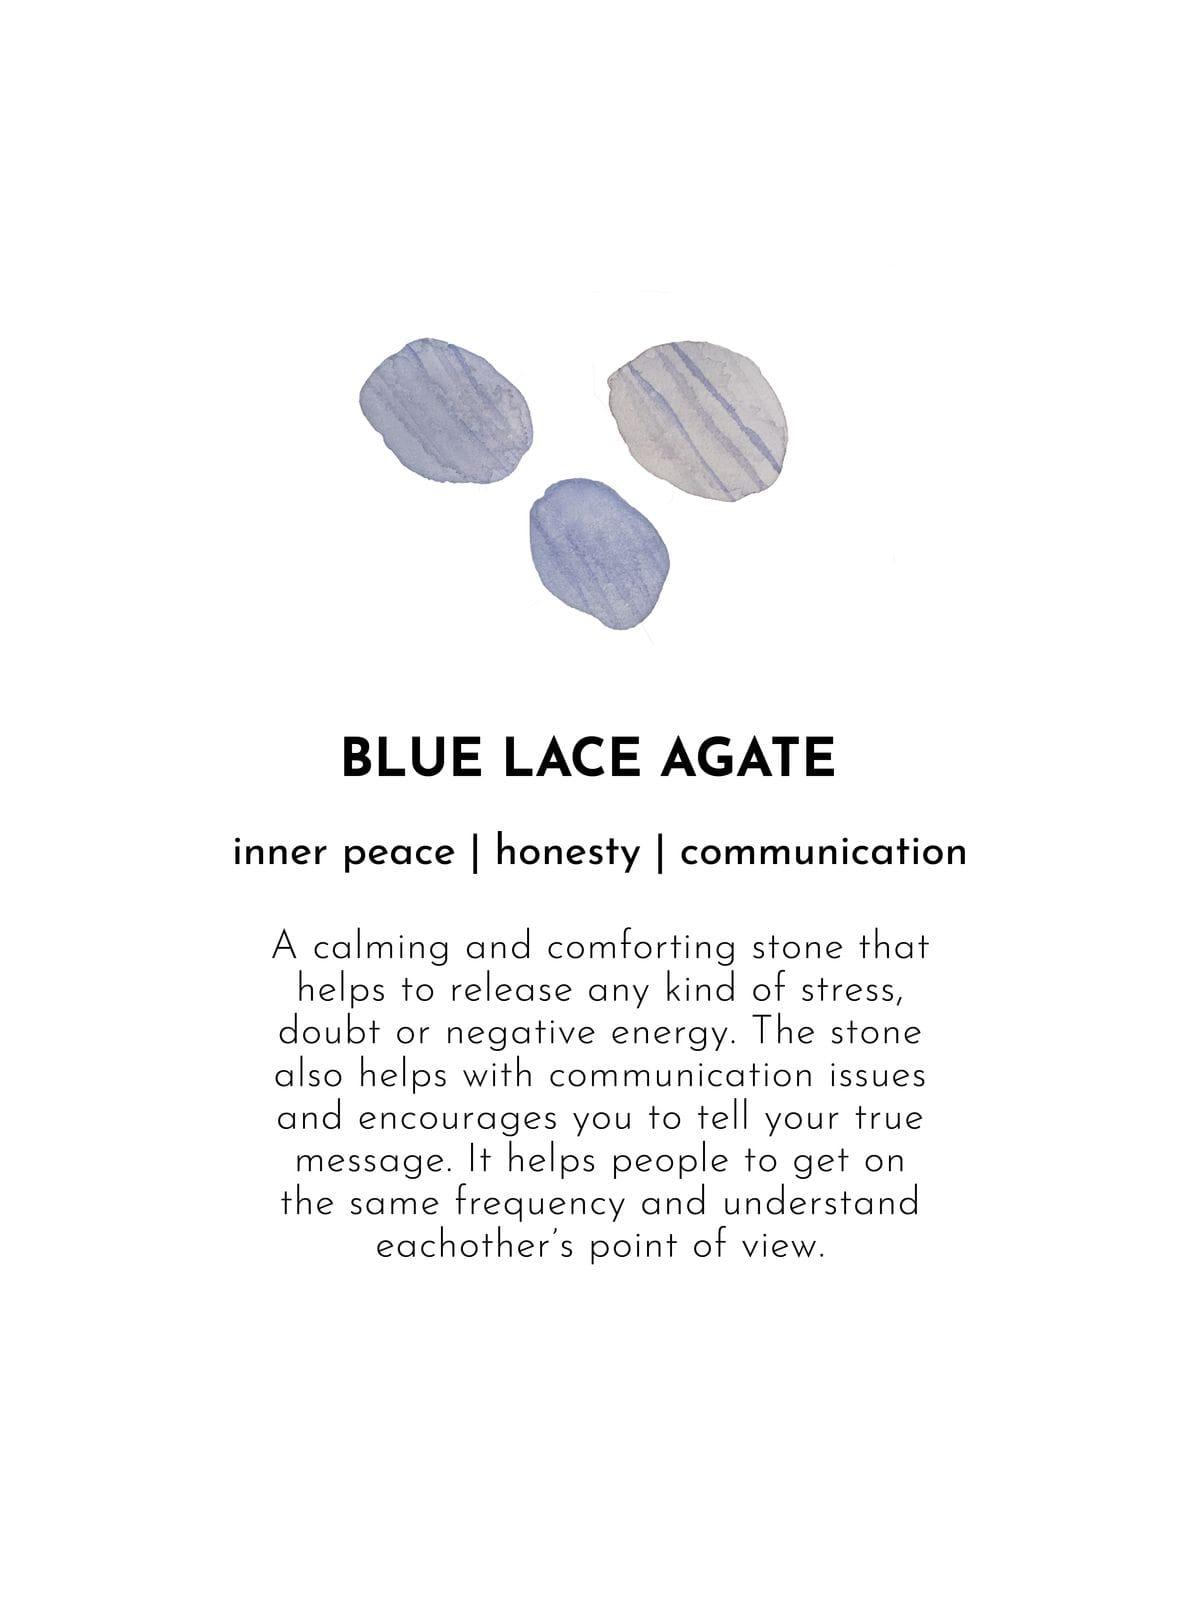 Blue Lace Agate_1200x1600